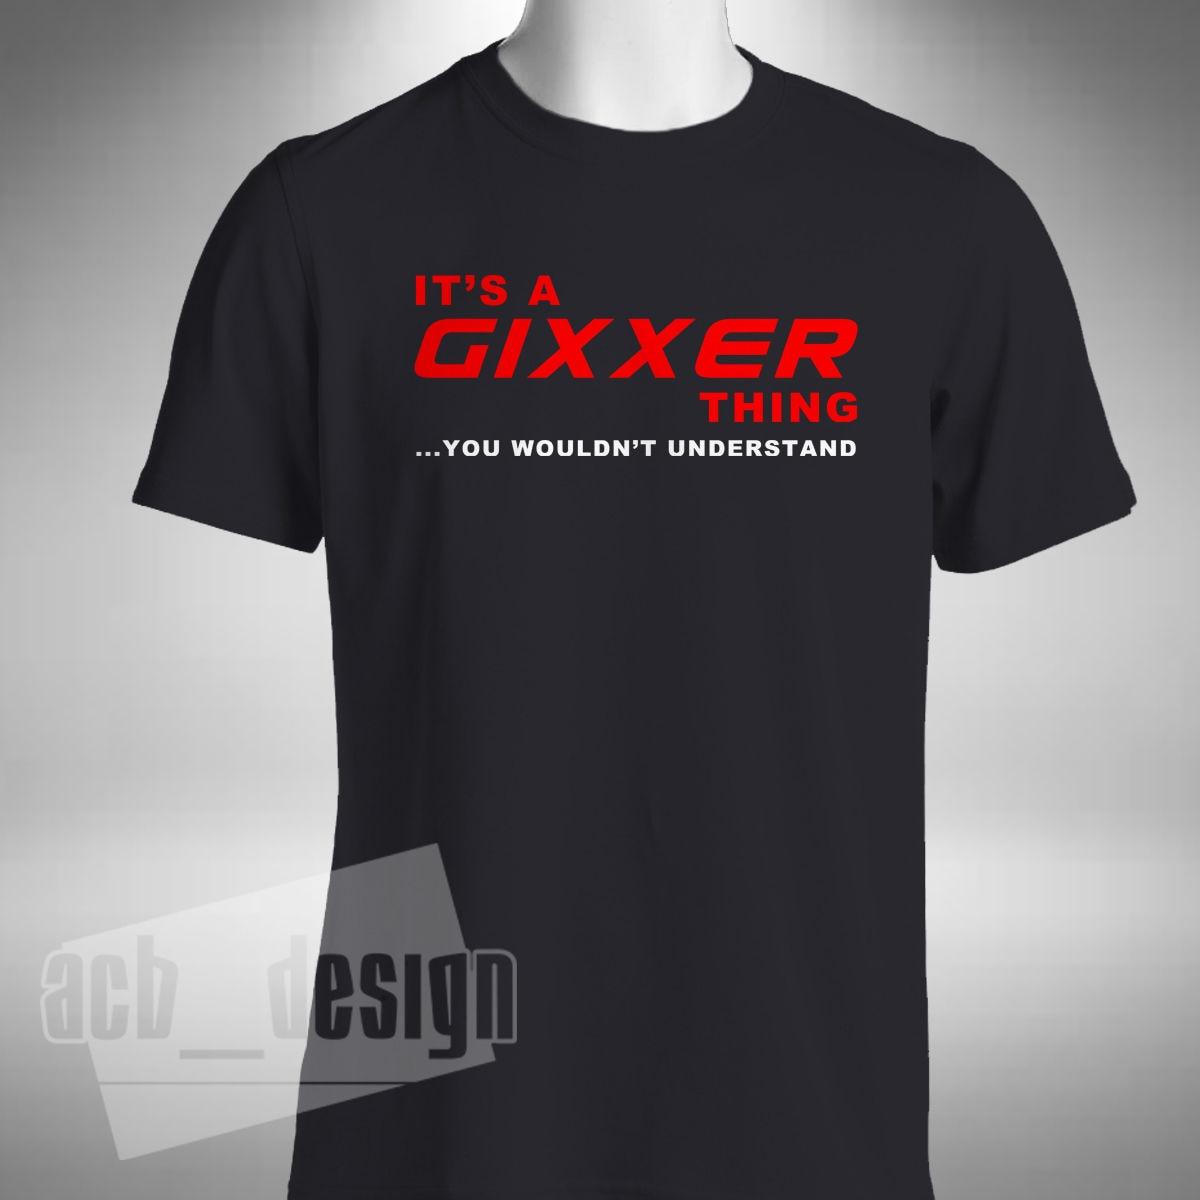 2019 nueva camiseta de moda Its GIXXER, camiseta para hombre, Superbike, motociclista, motocicleta japonesa, camiseta de verano GSXR 1000r